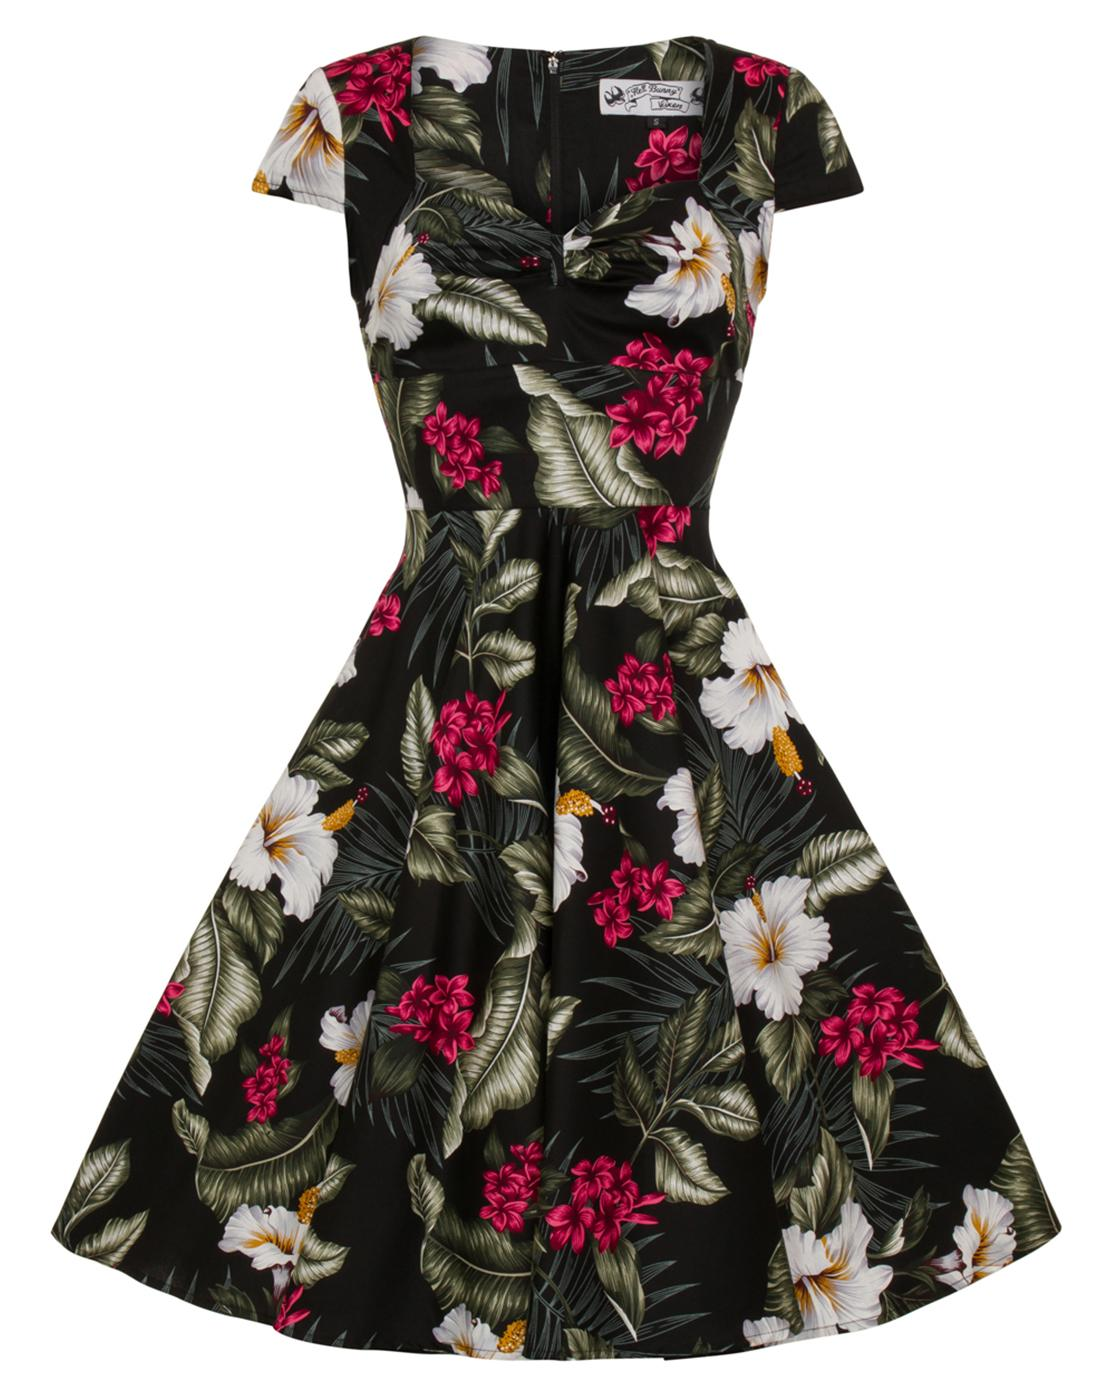 Kalei HELL BUNNY Vintage Floral Print 50s Dress